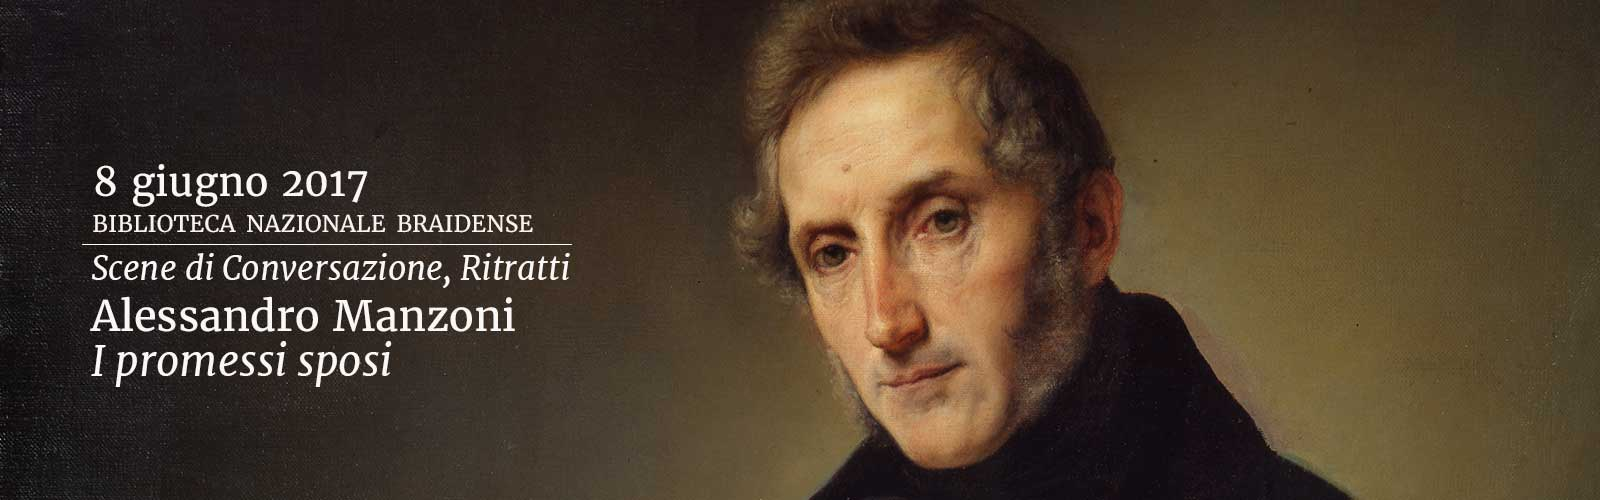 Alessandro Manzoni, <em>I promessi sposi</em>